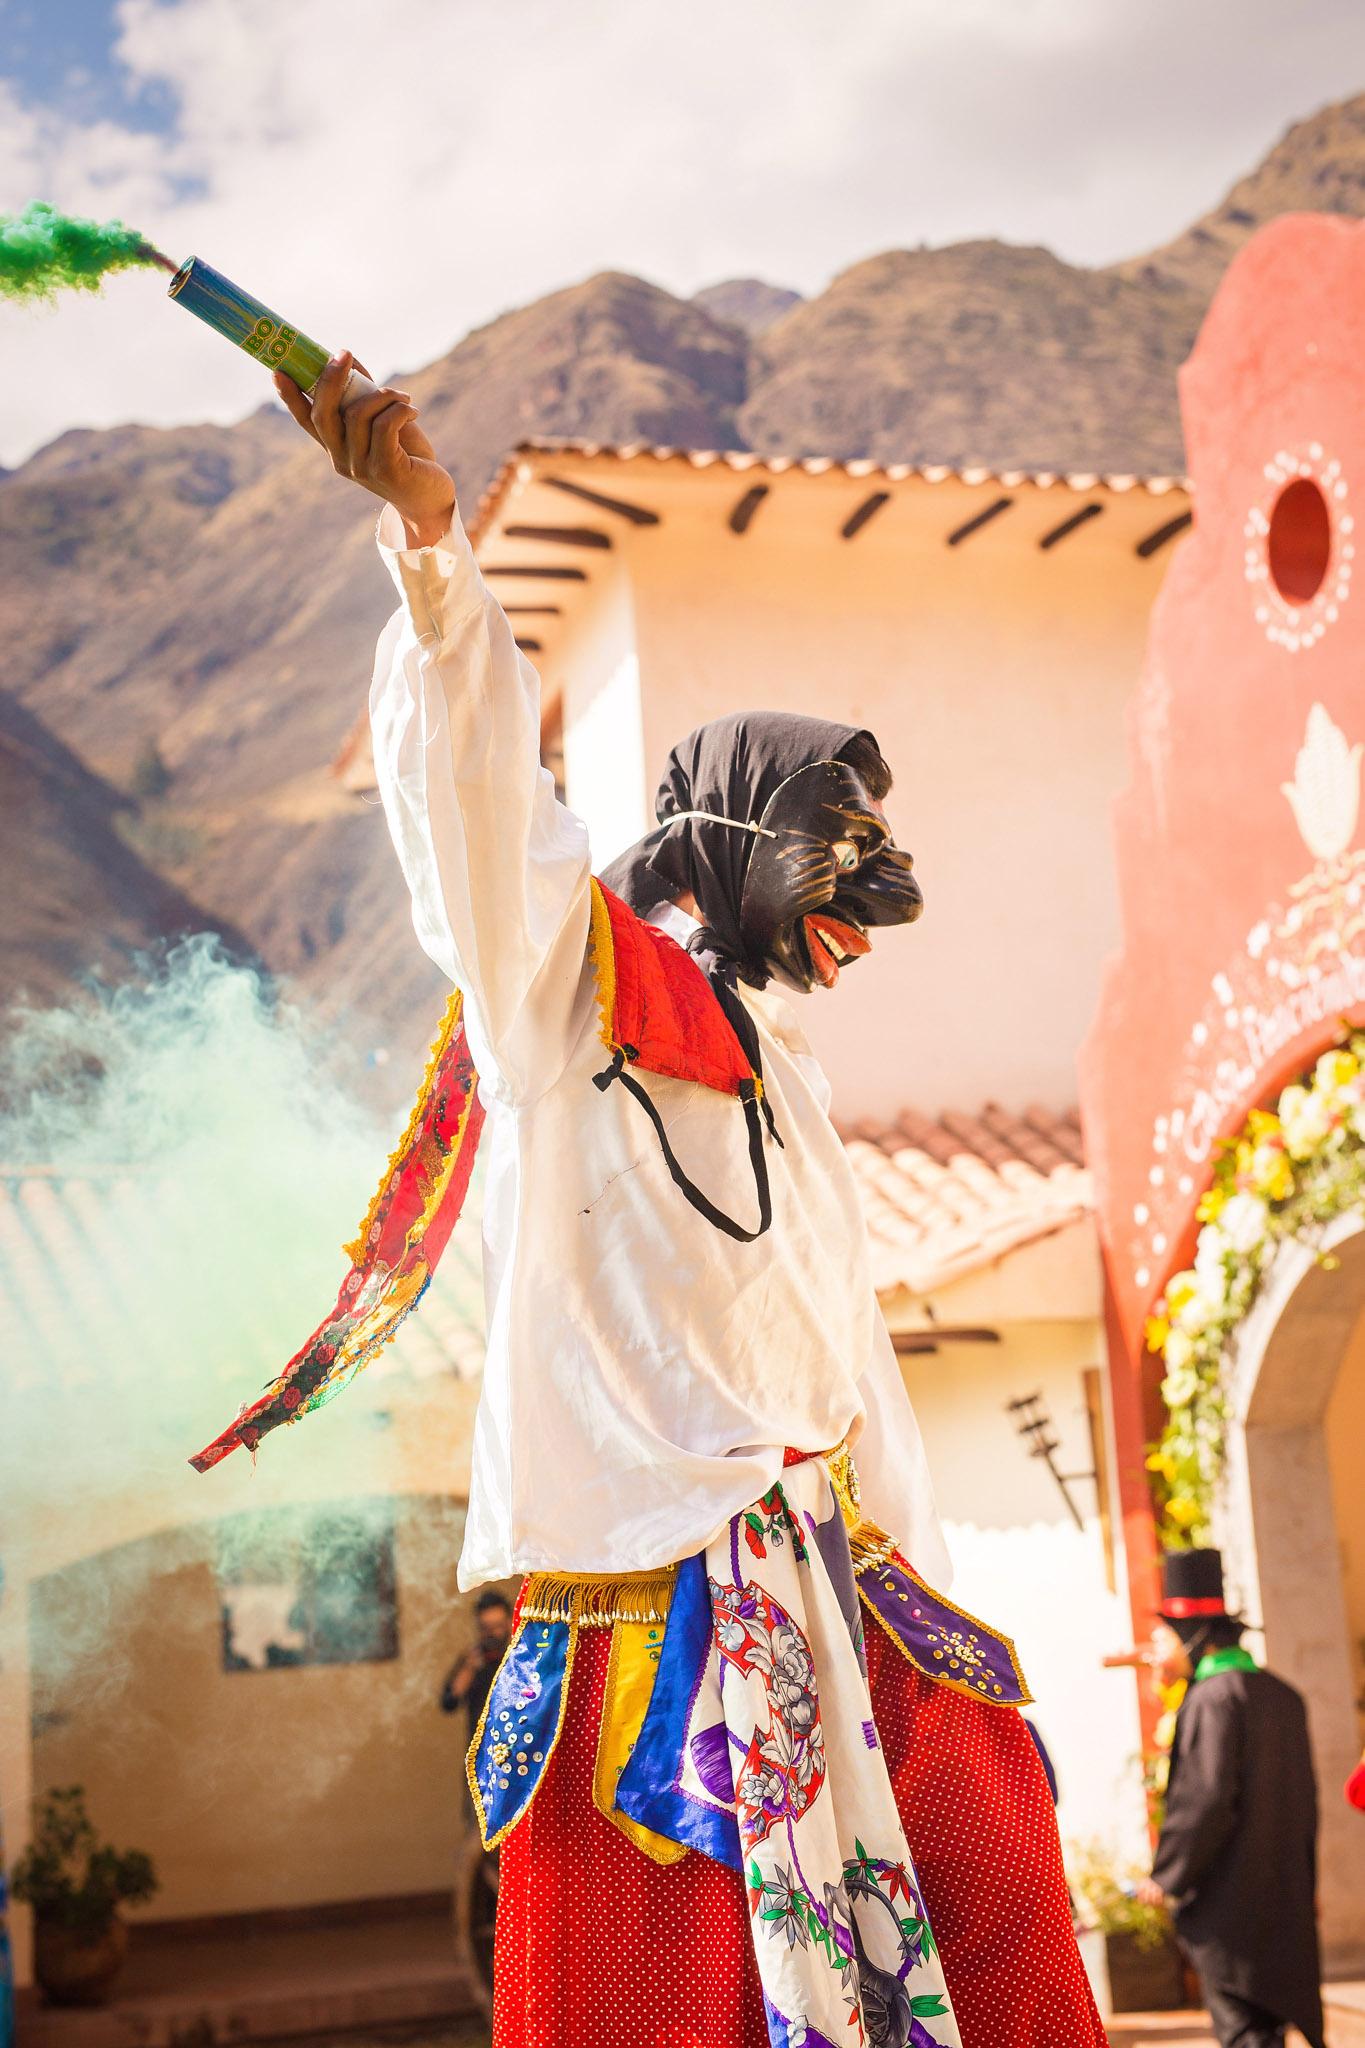 Wedding-Travellers-Destination-Wedding-Peru-Cusco-Hacienda-Sarapampa-Sacred-Valley-amusement-entertainment-traditional-costumes